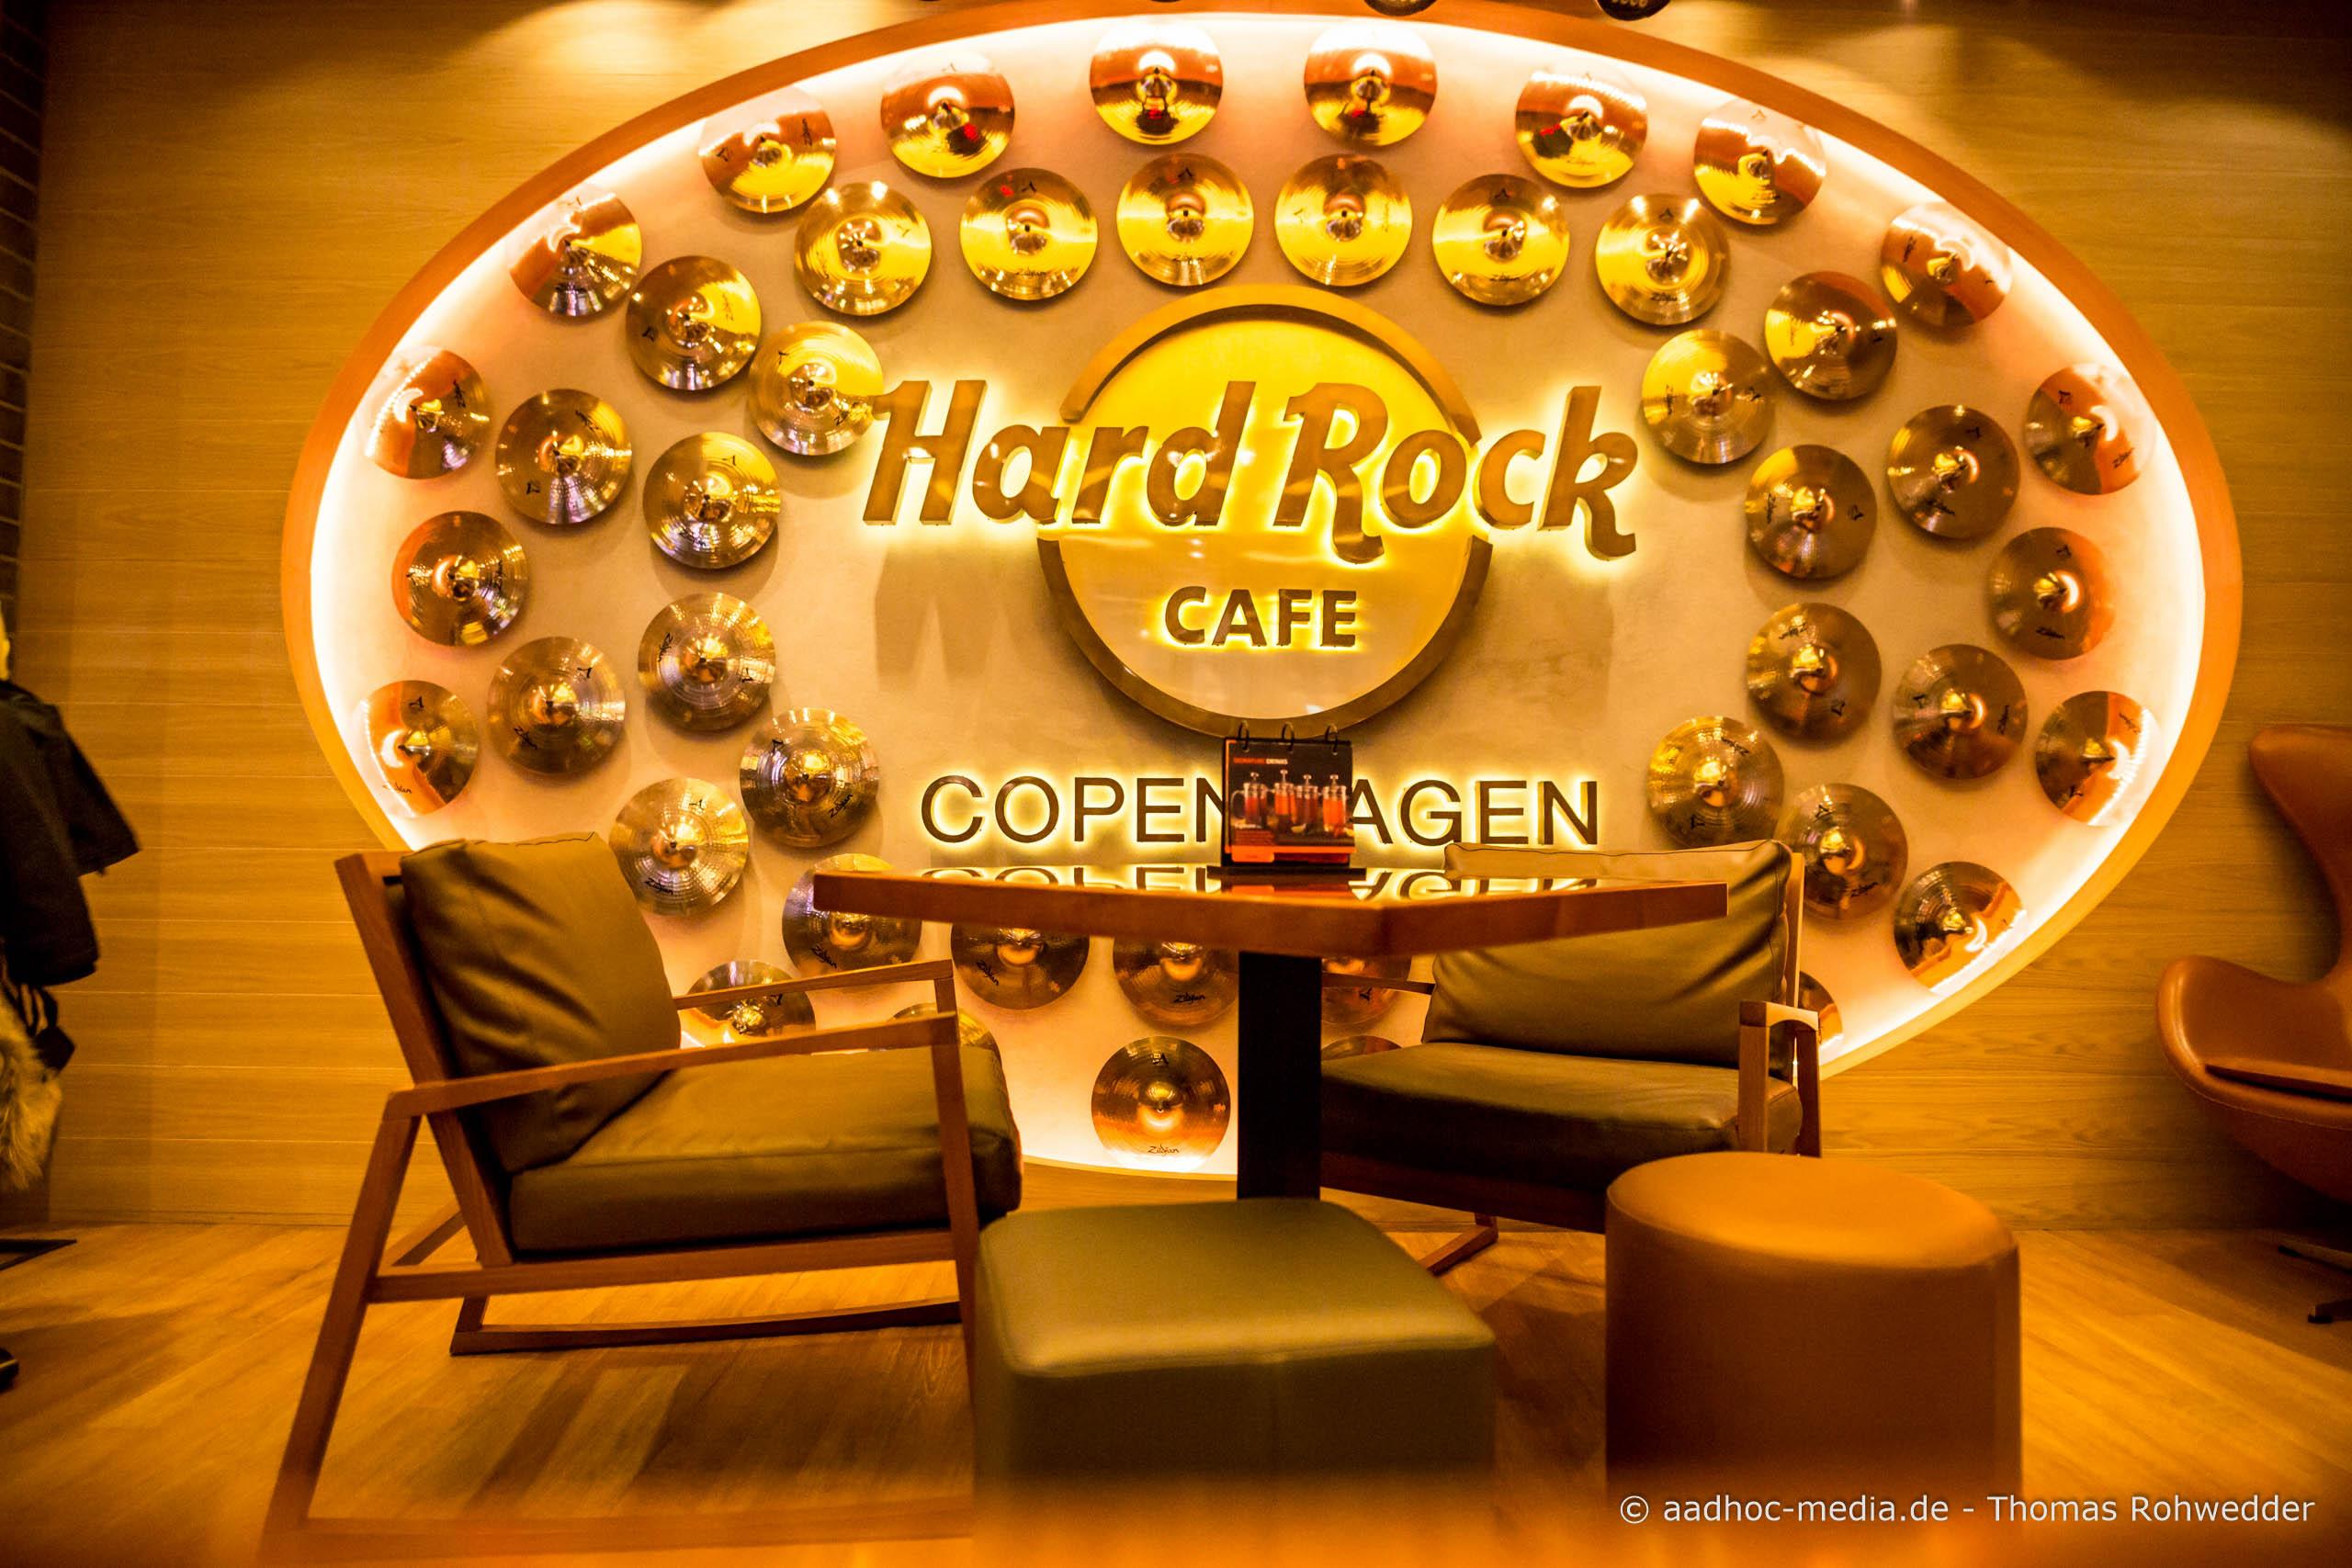 Hardrock Cafe - Copenhagen - copyright aadhoc-media.de - Thomas Rohwedder - Momentalist - Hochzeitsfotograf